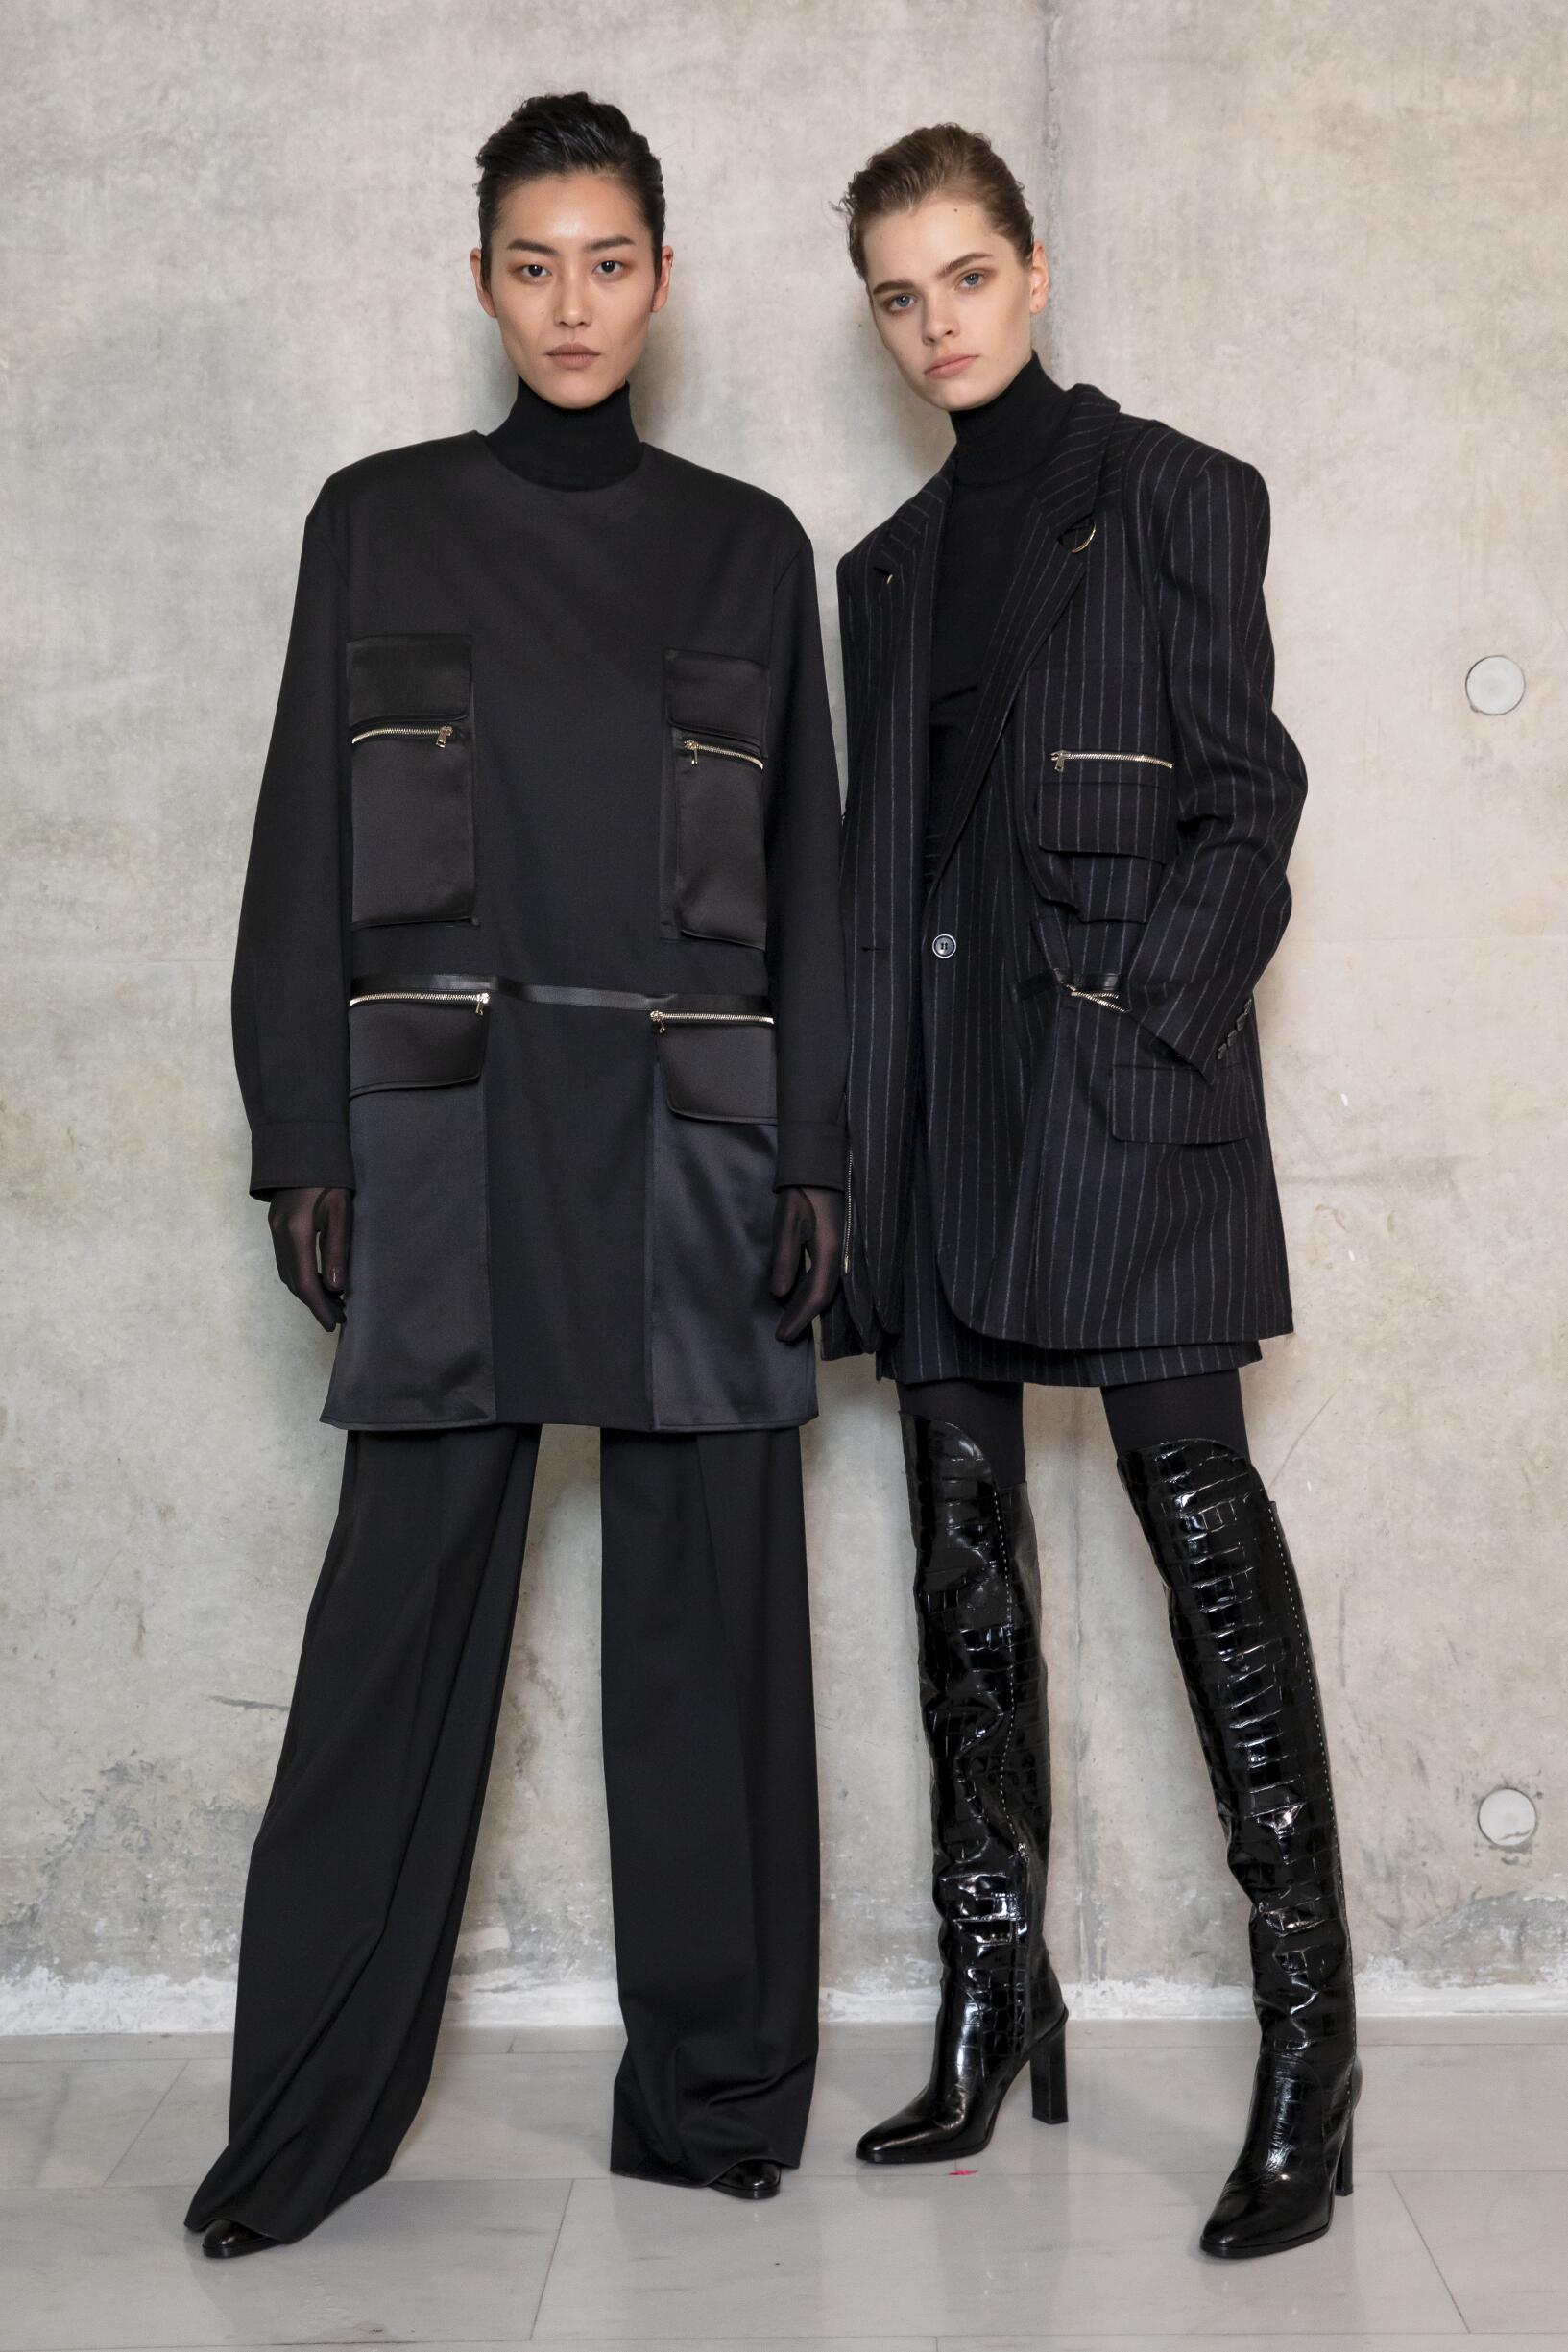 Backstage Max Mara Fall Womenswear 2019